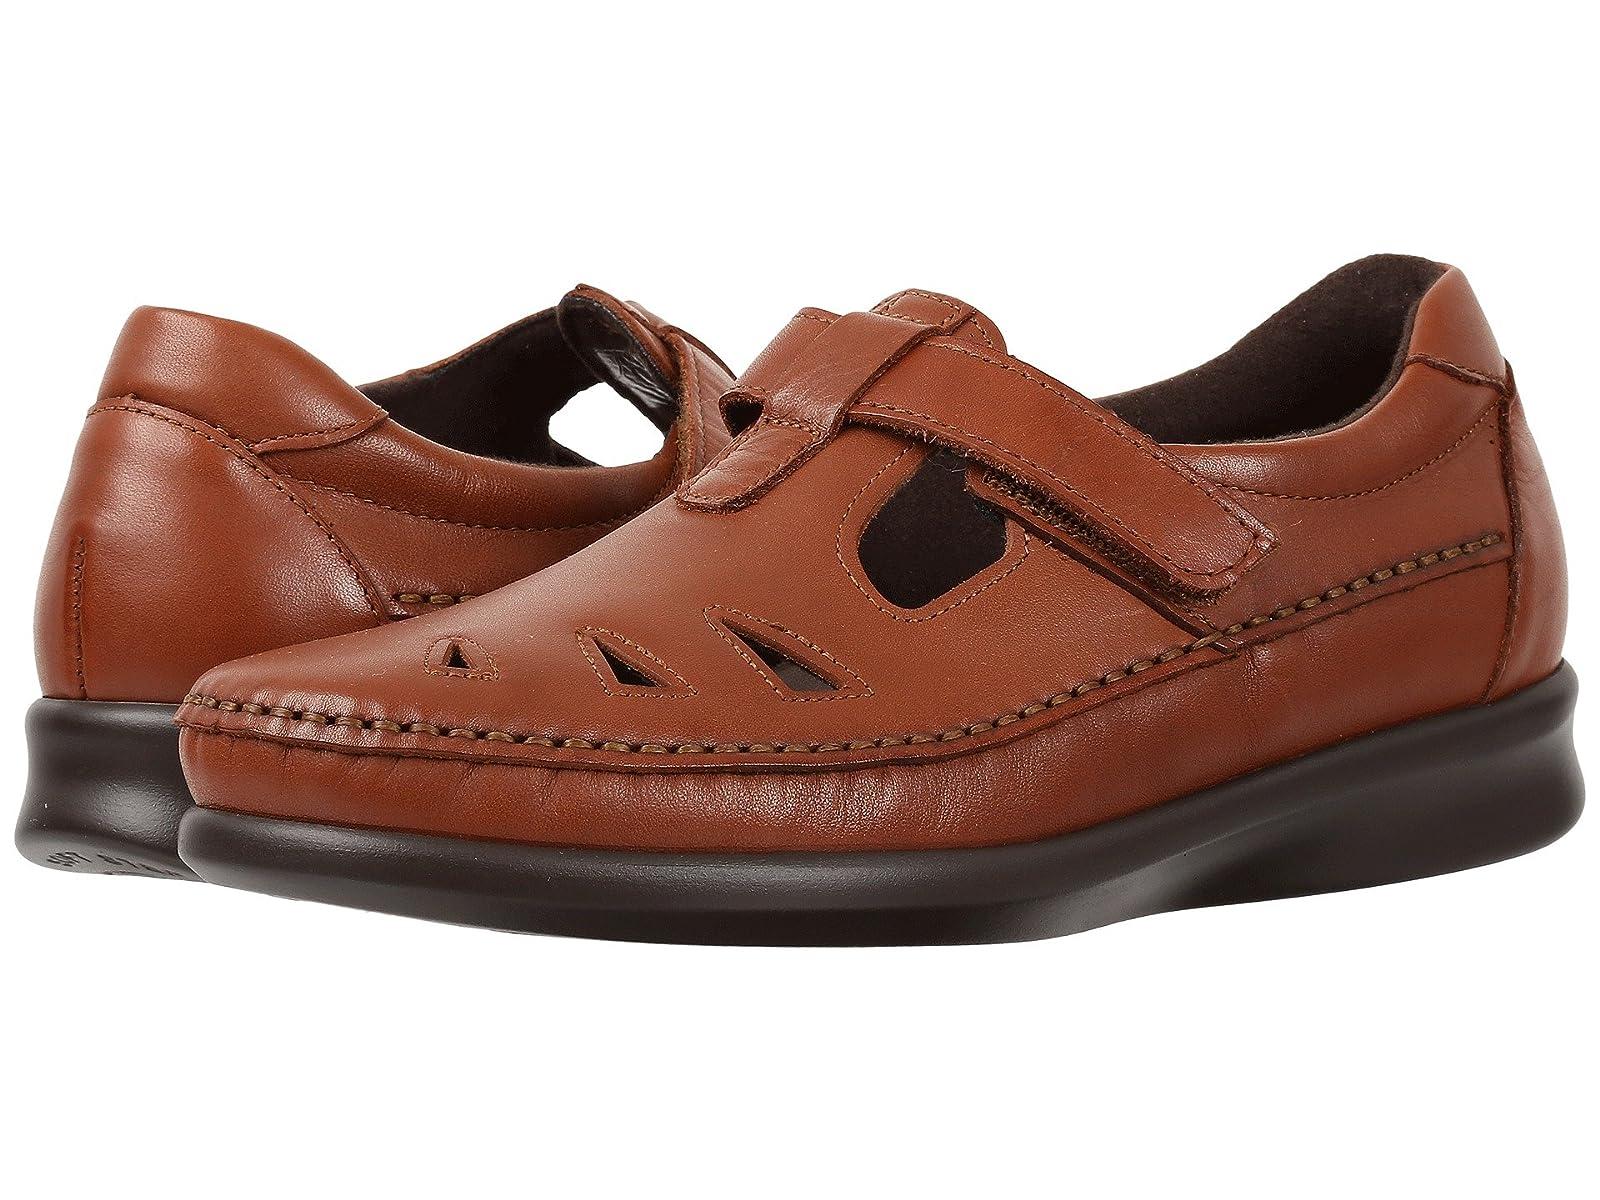 SAS RoamerAtmospheric grades have affordable shoes